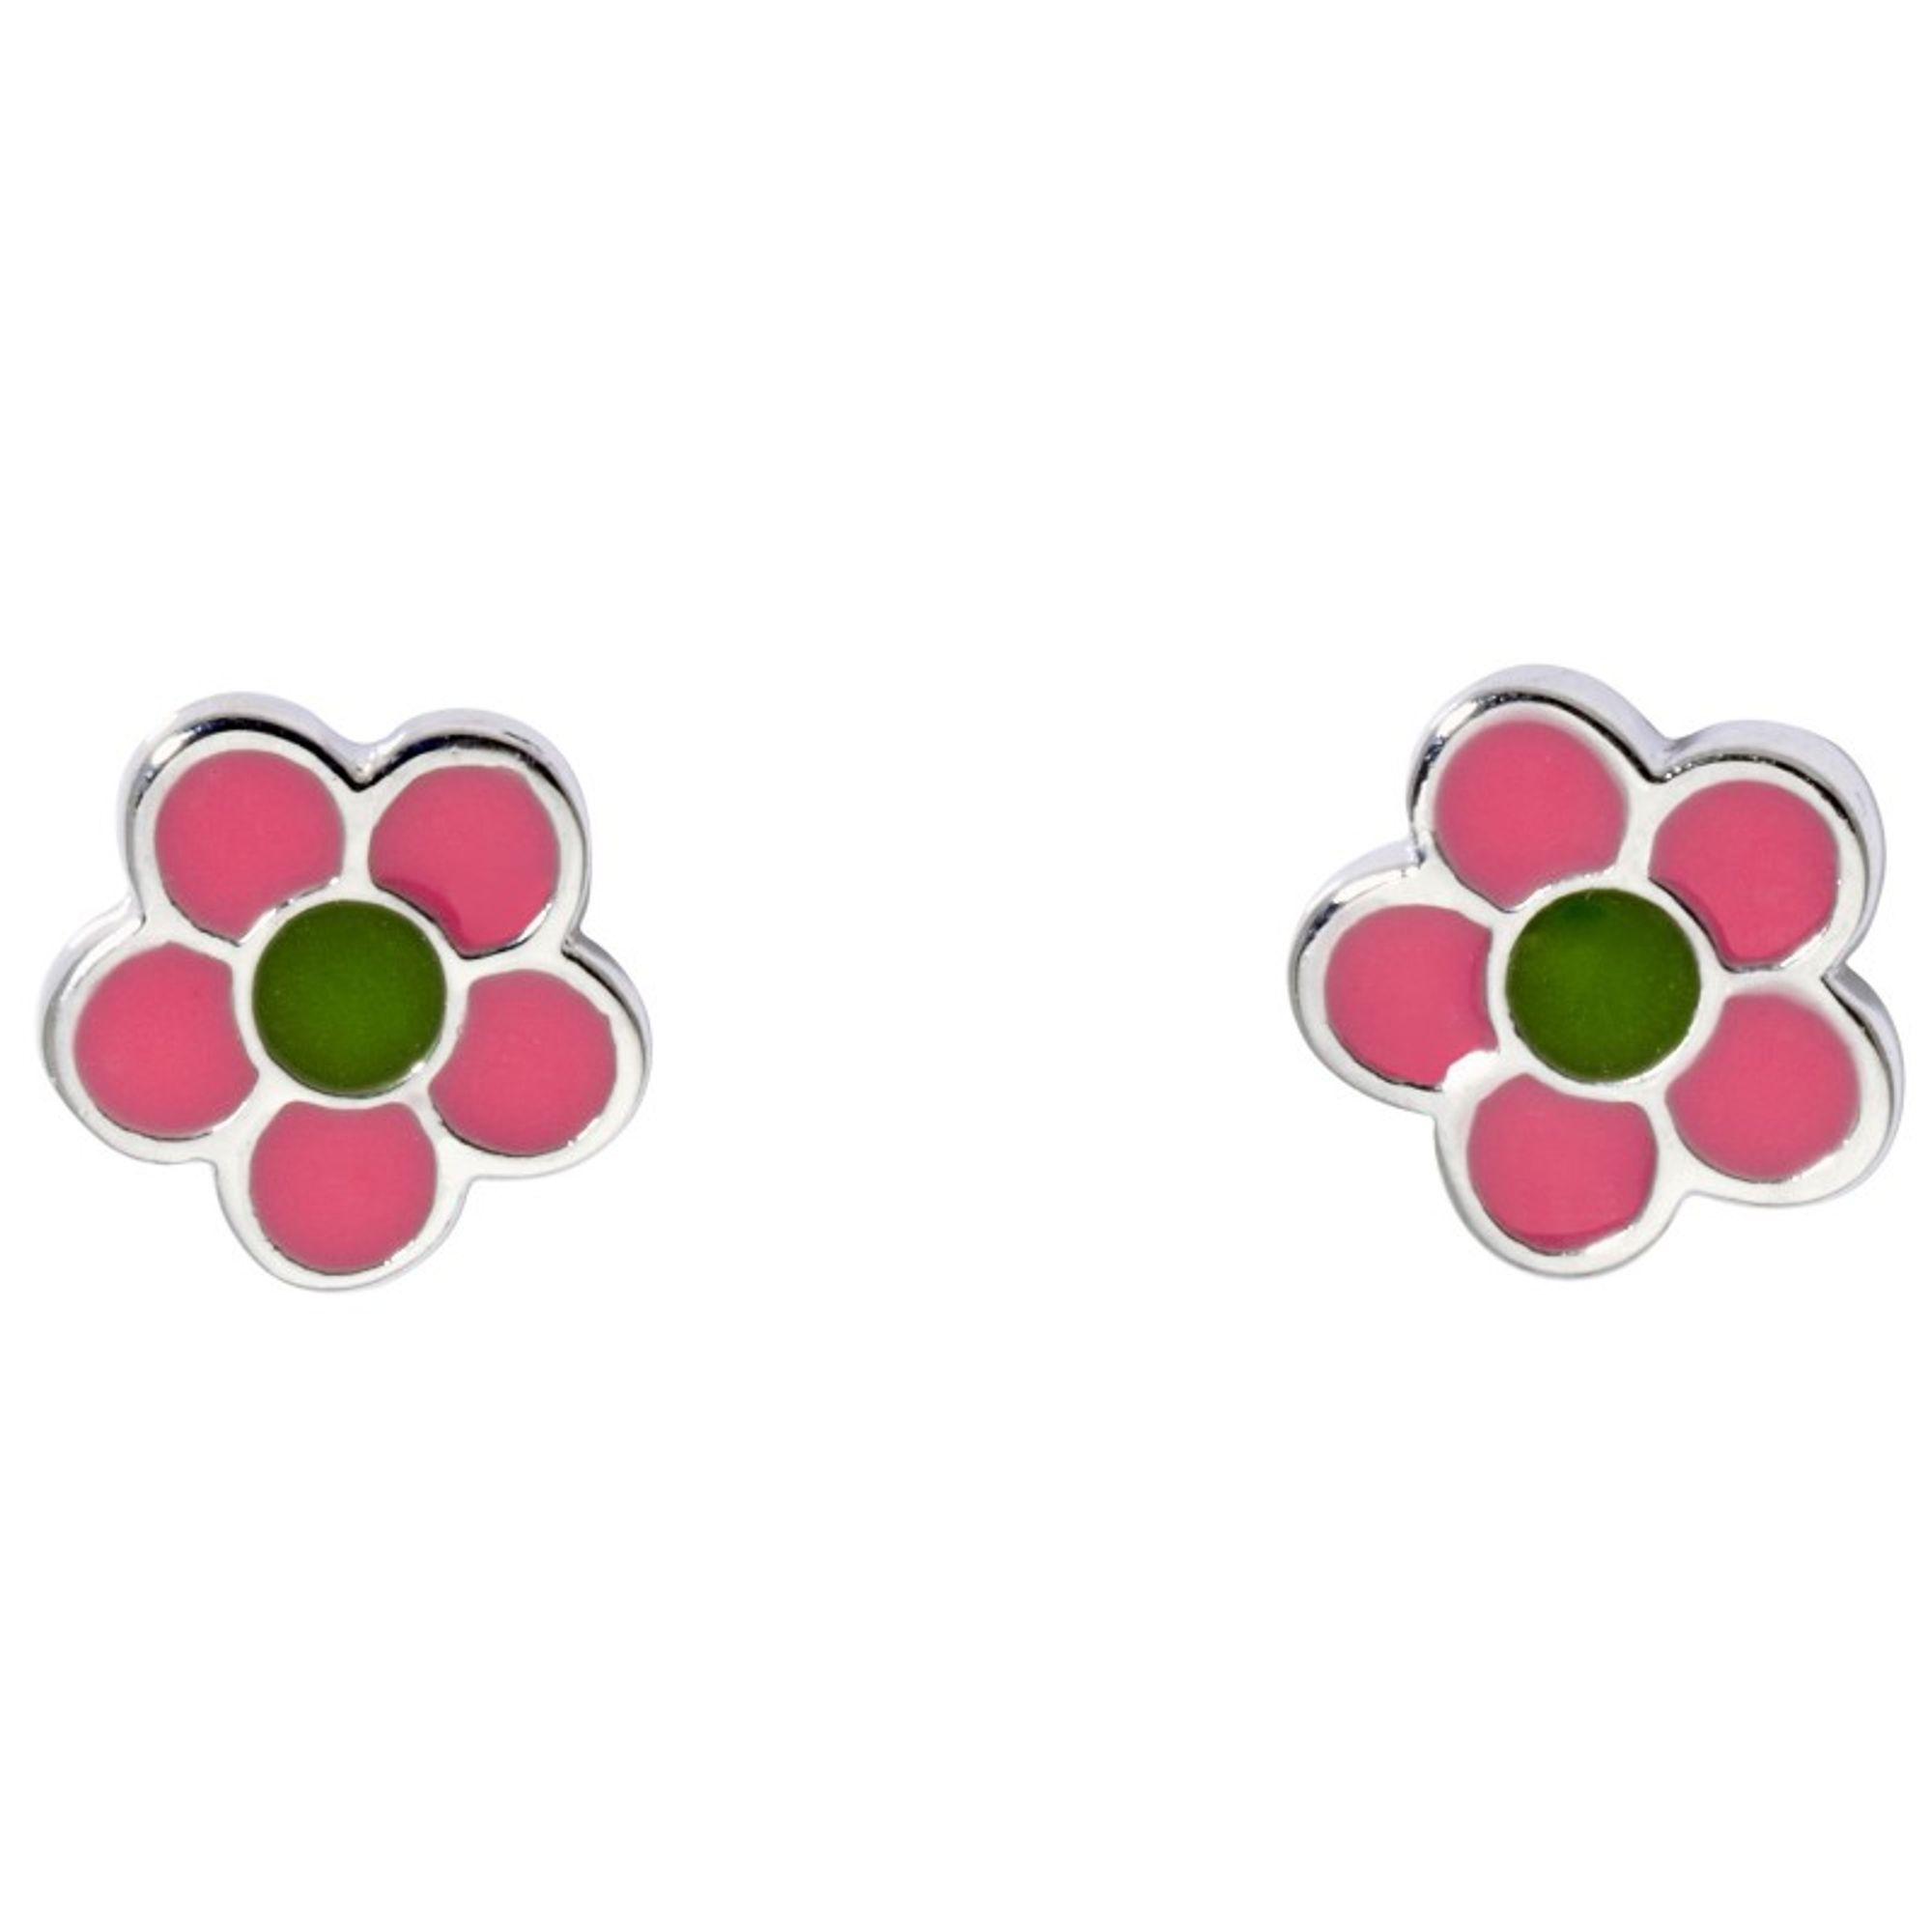 Basic Silber SK22 Kinder Ohrschmuck Blume rosa grün Silber